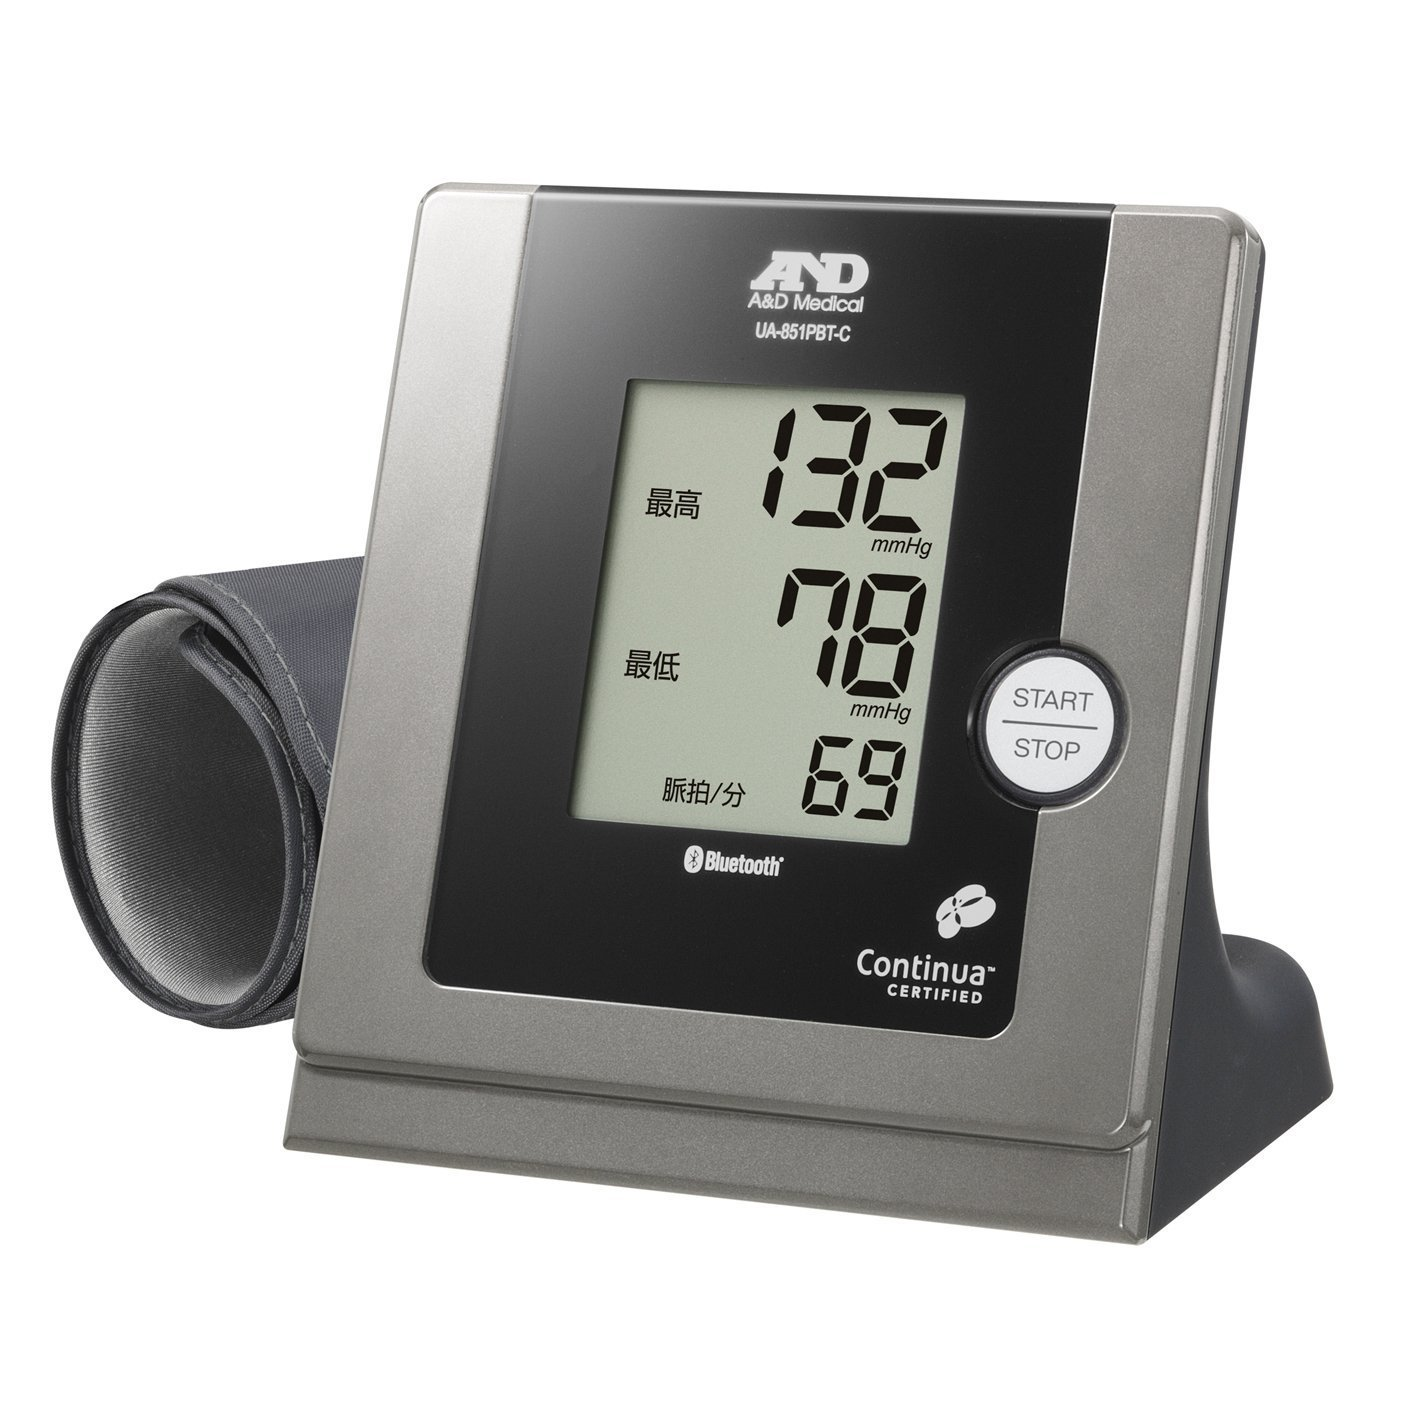 iPhone/iPadにBluetoothでつながる家庭用血圧計 UA-851BTC-JC B00H9Z98DO